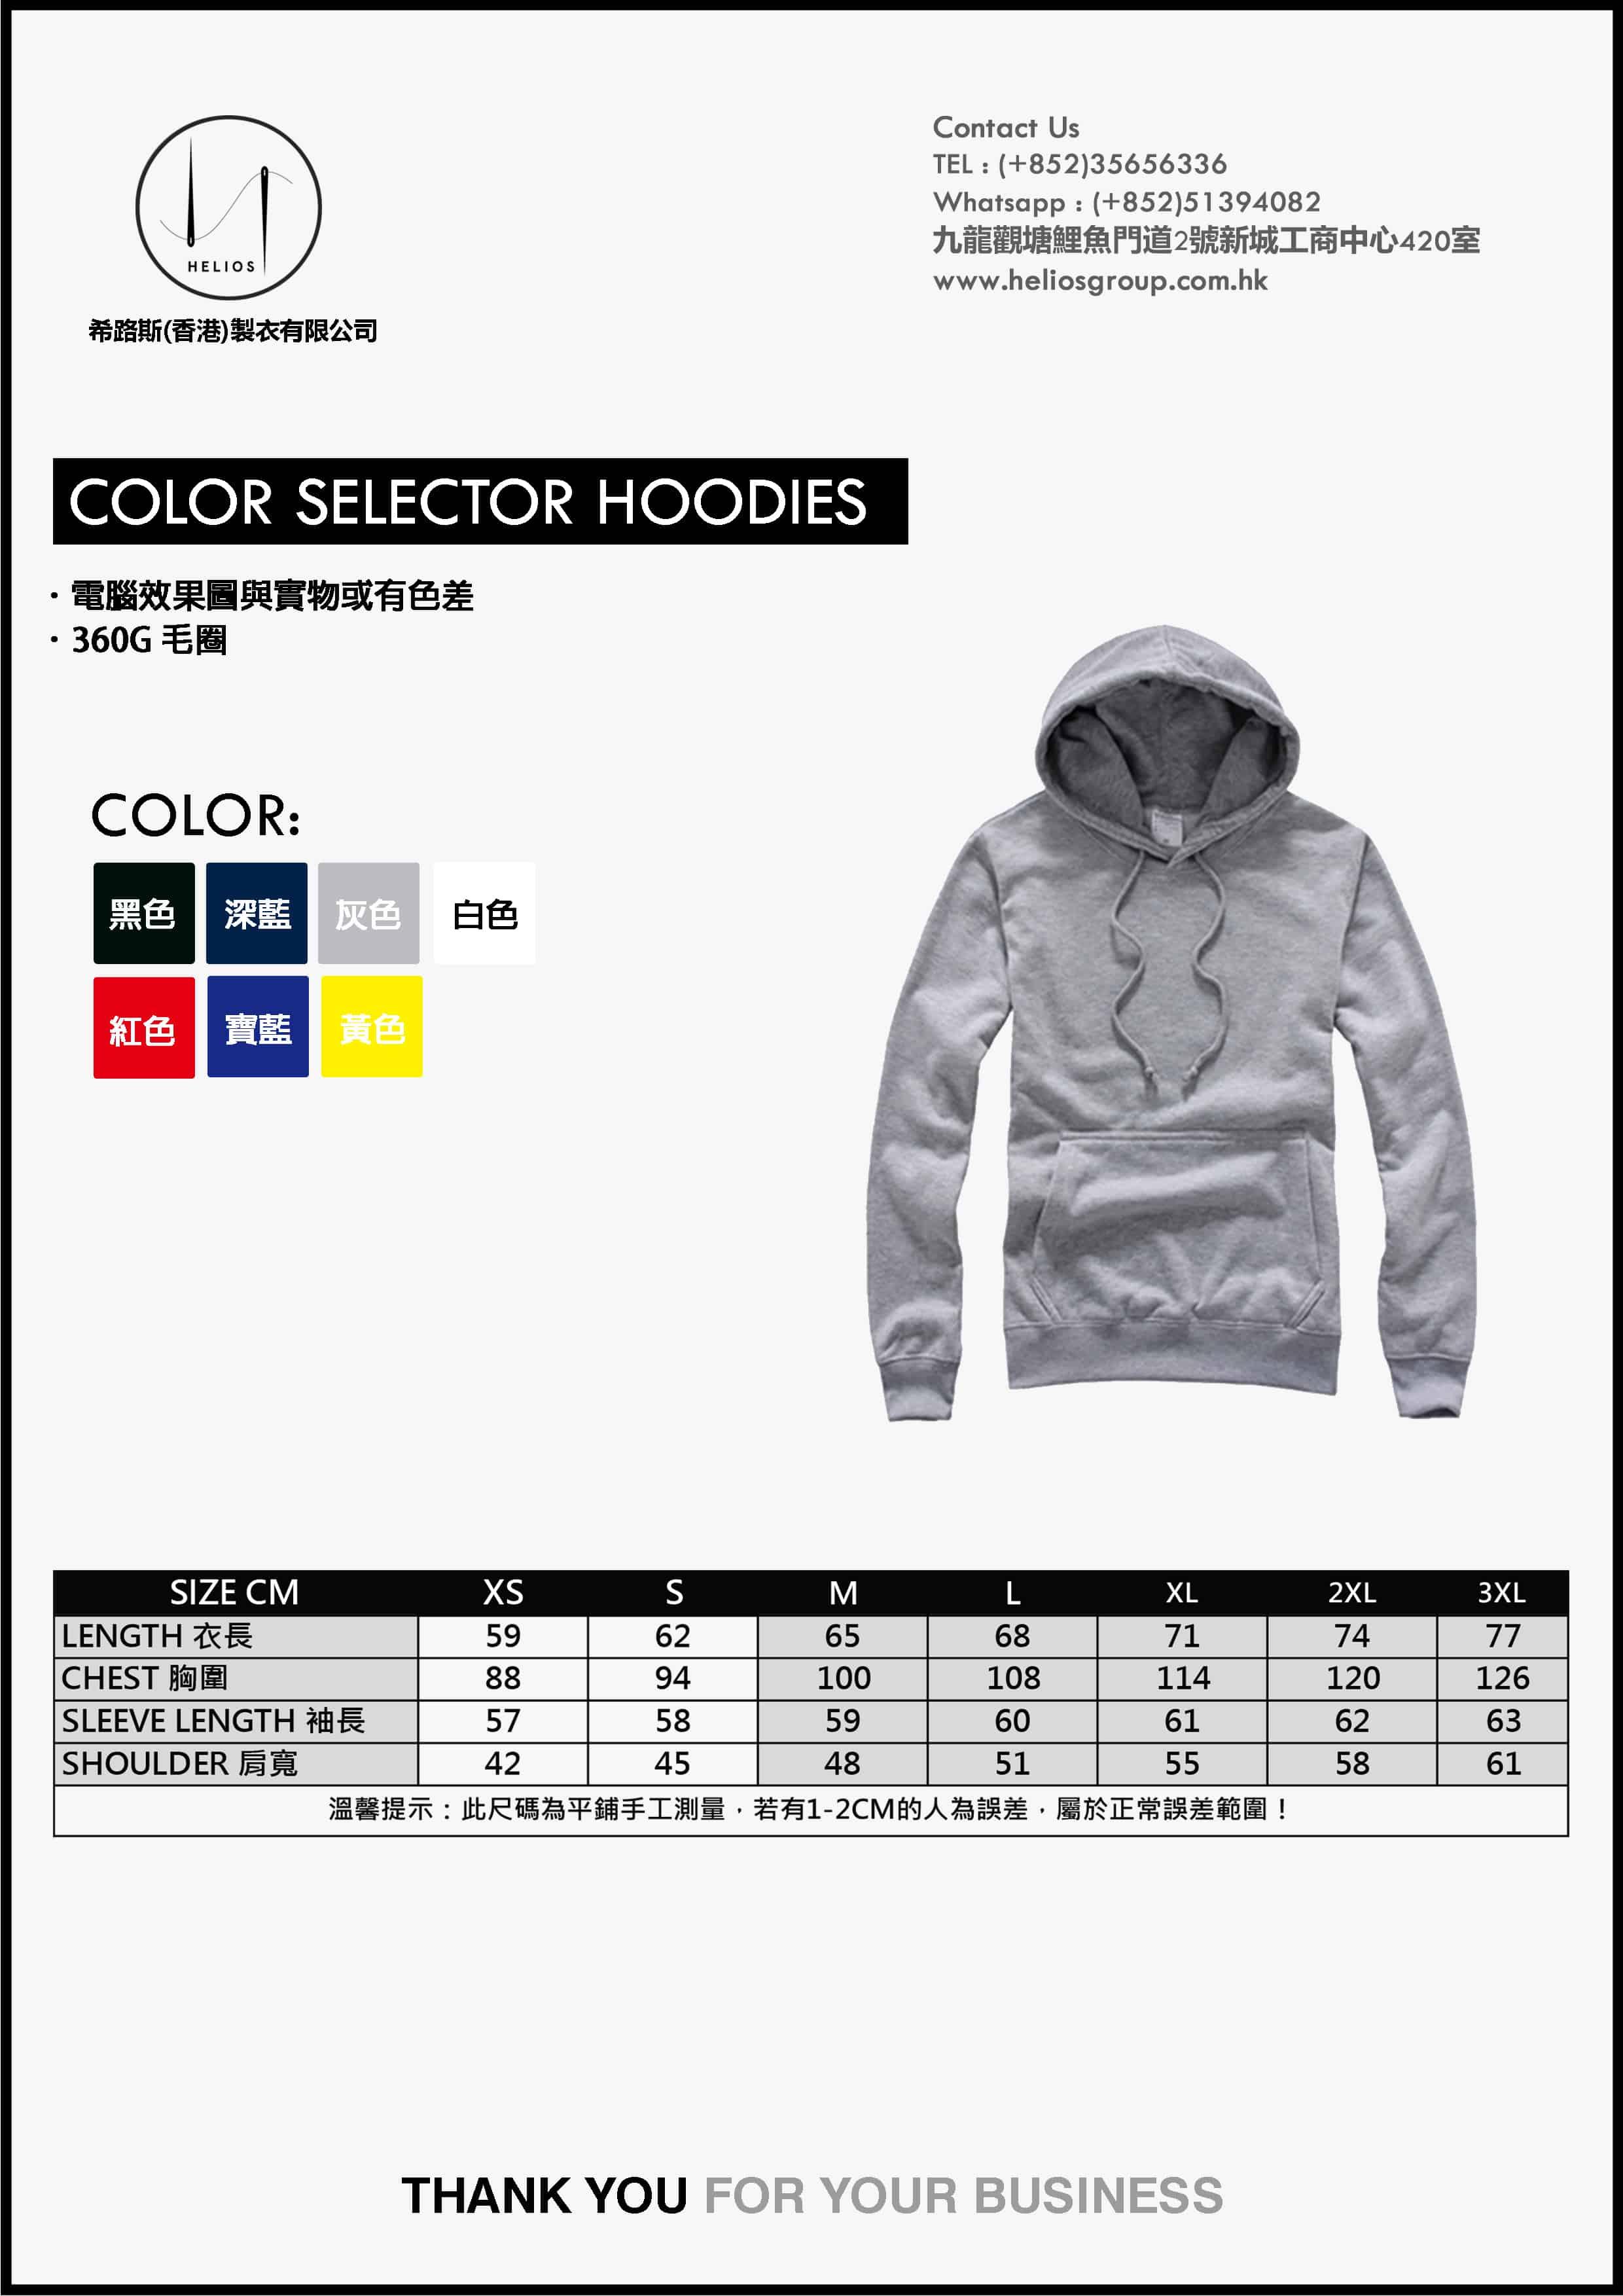 hoodies 360G尺碼表